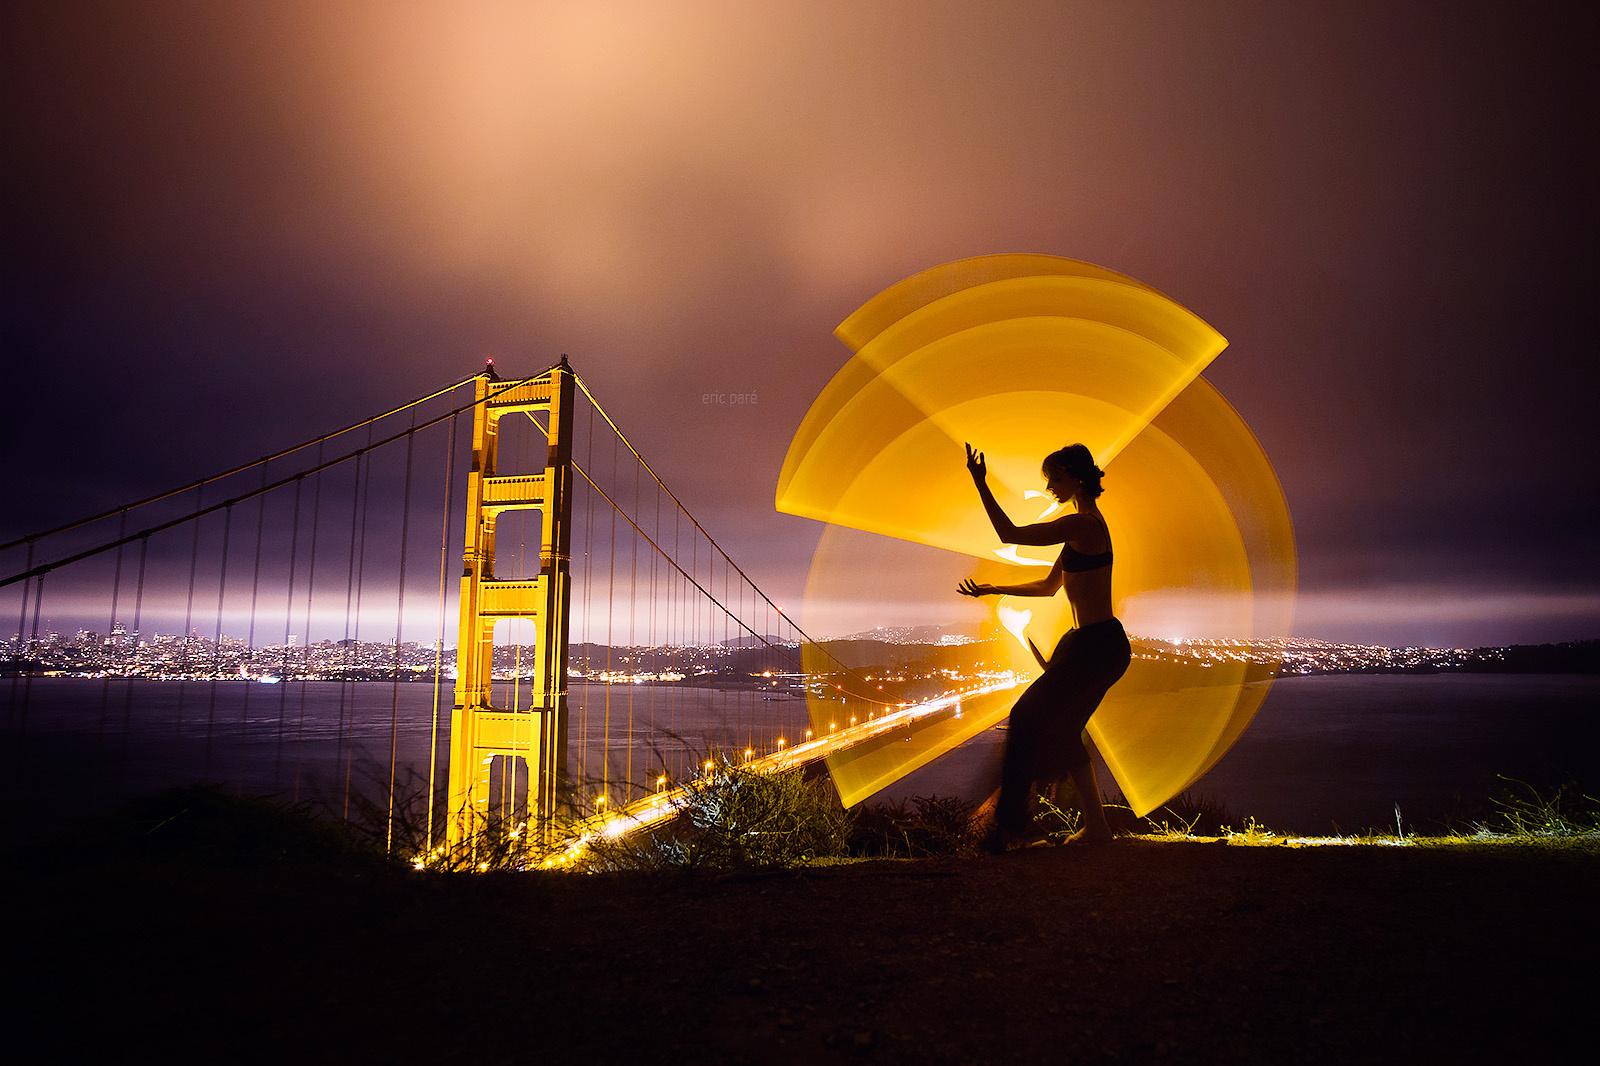 500px blog the passionate photographer community diy for Diy light art